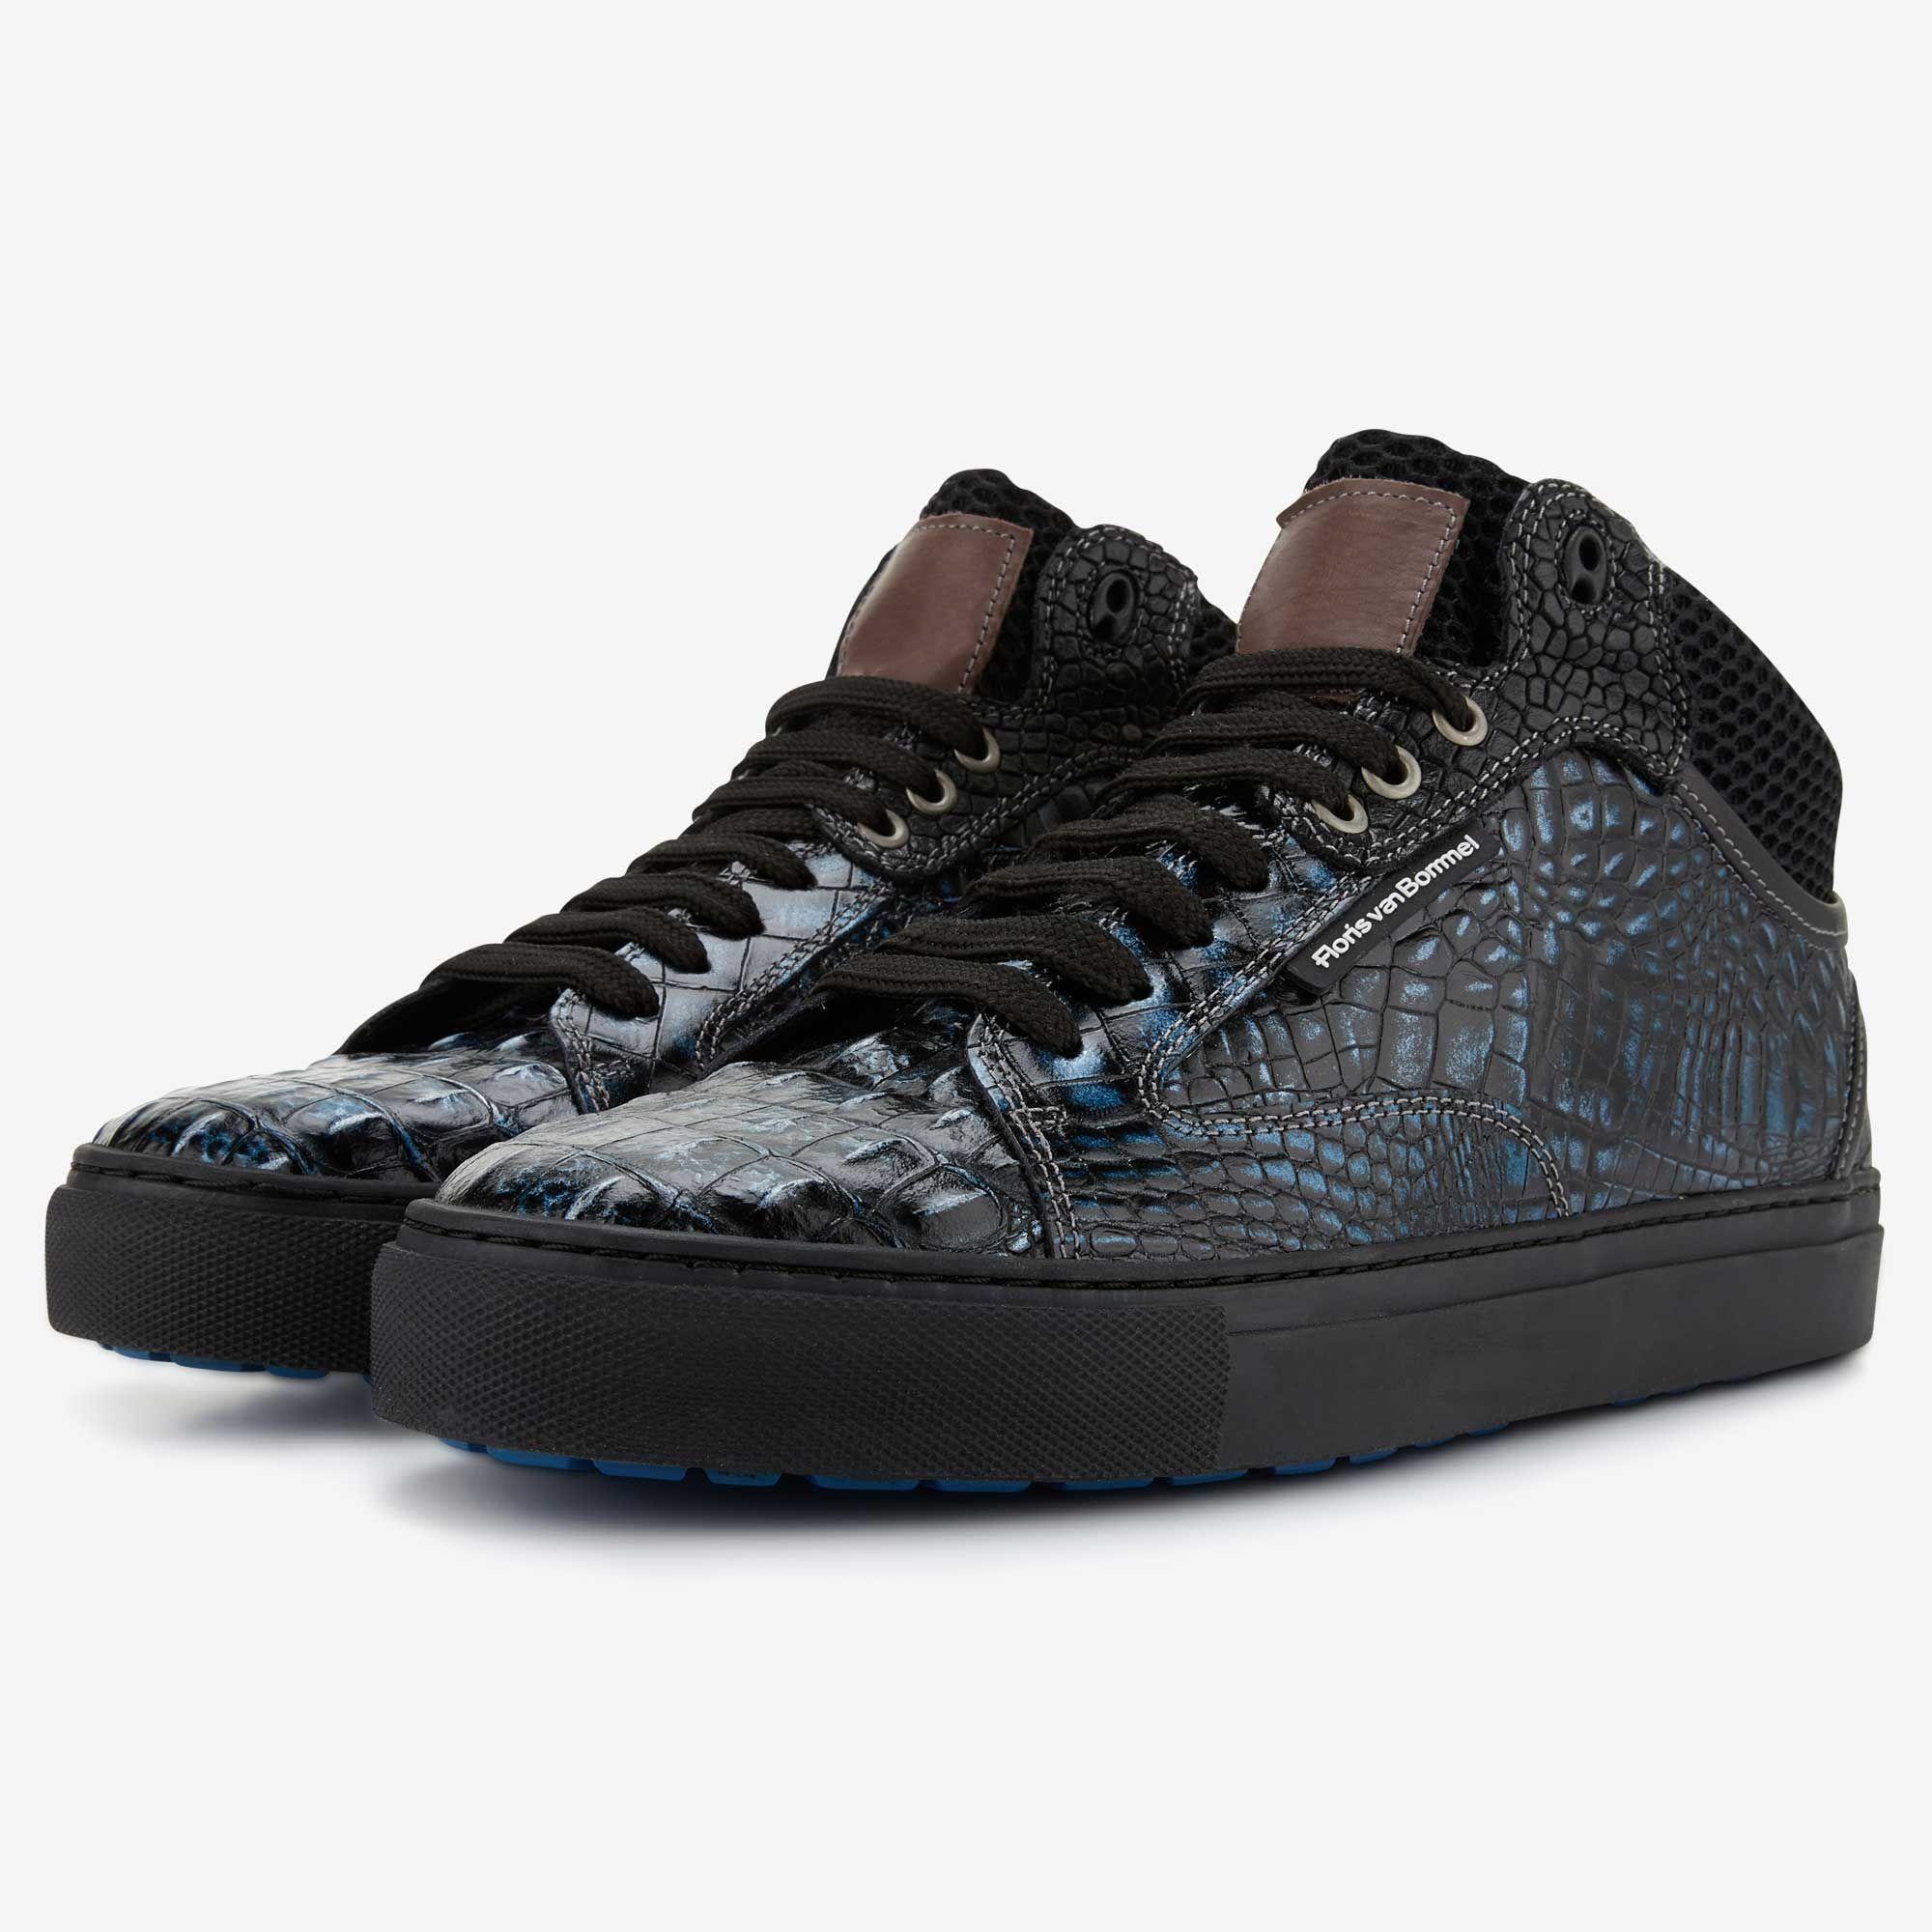 Blue Metallic Men S Sneaker With Crocodile Print 10864 02 Floris Van Bommel Sneakers Men Mens Shoes Online Shoes Mens